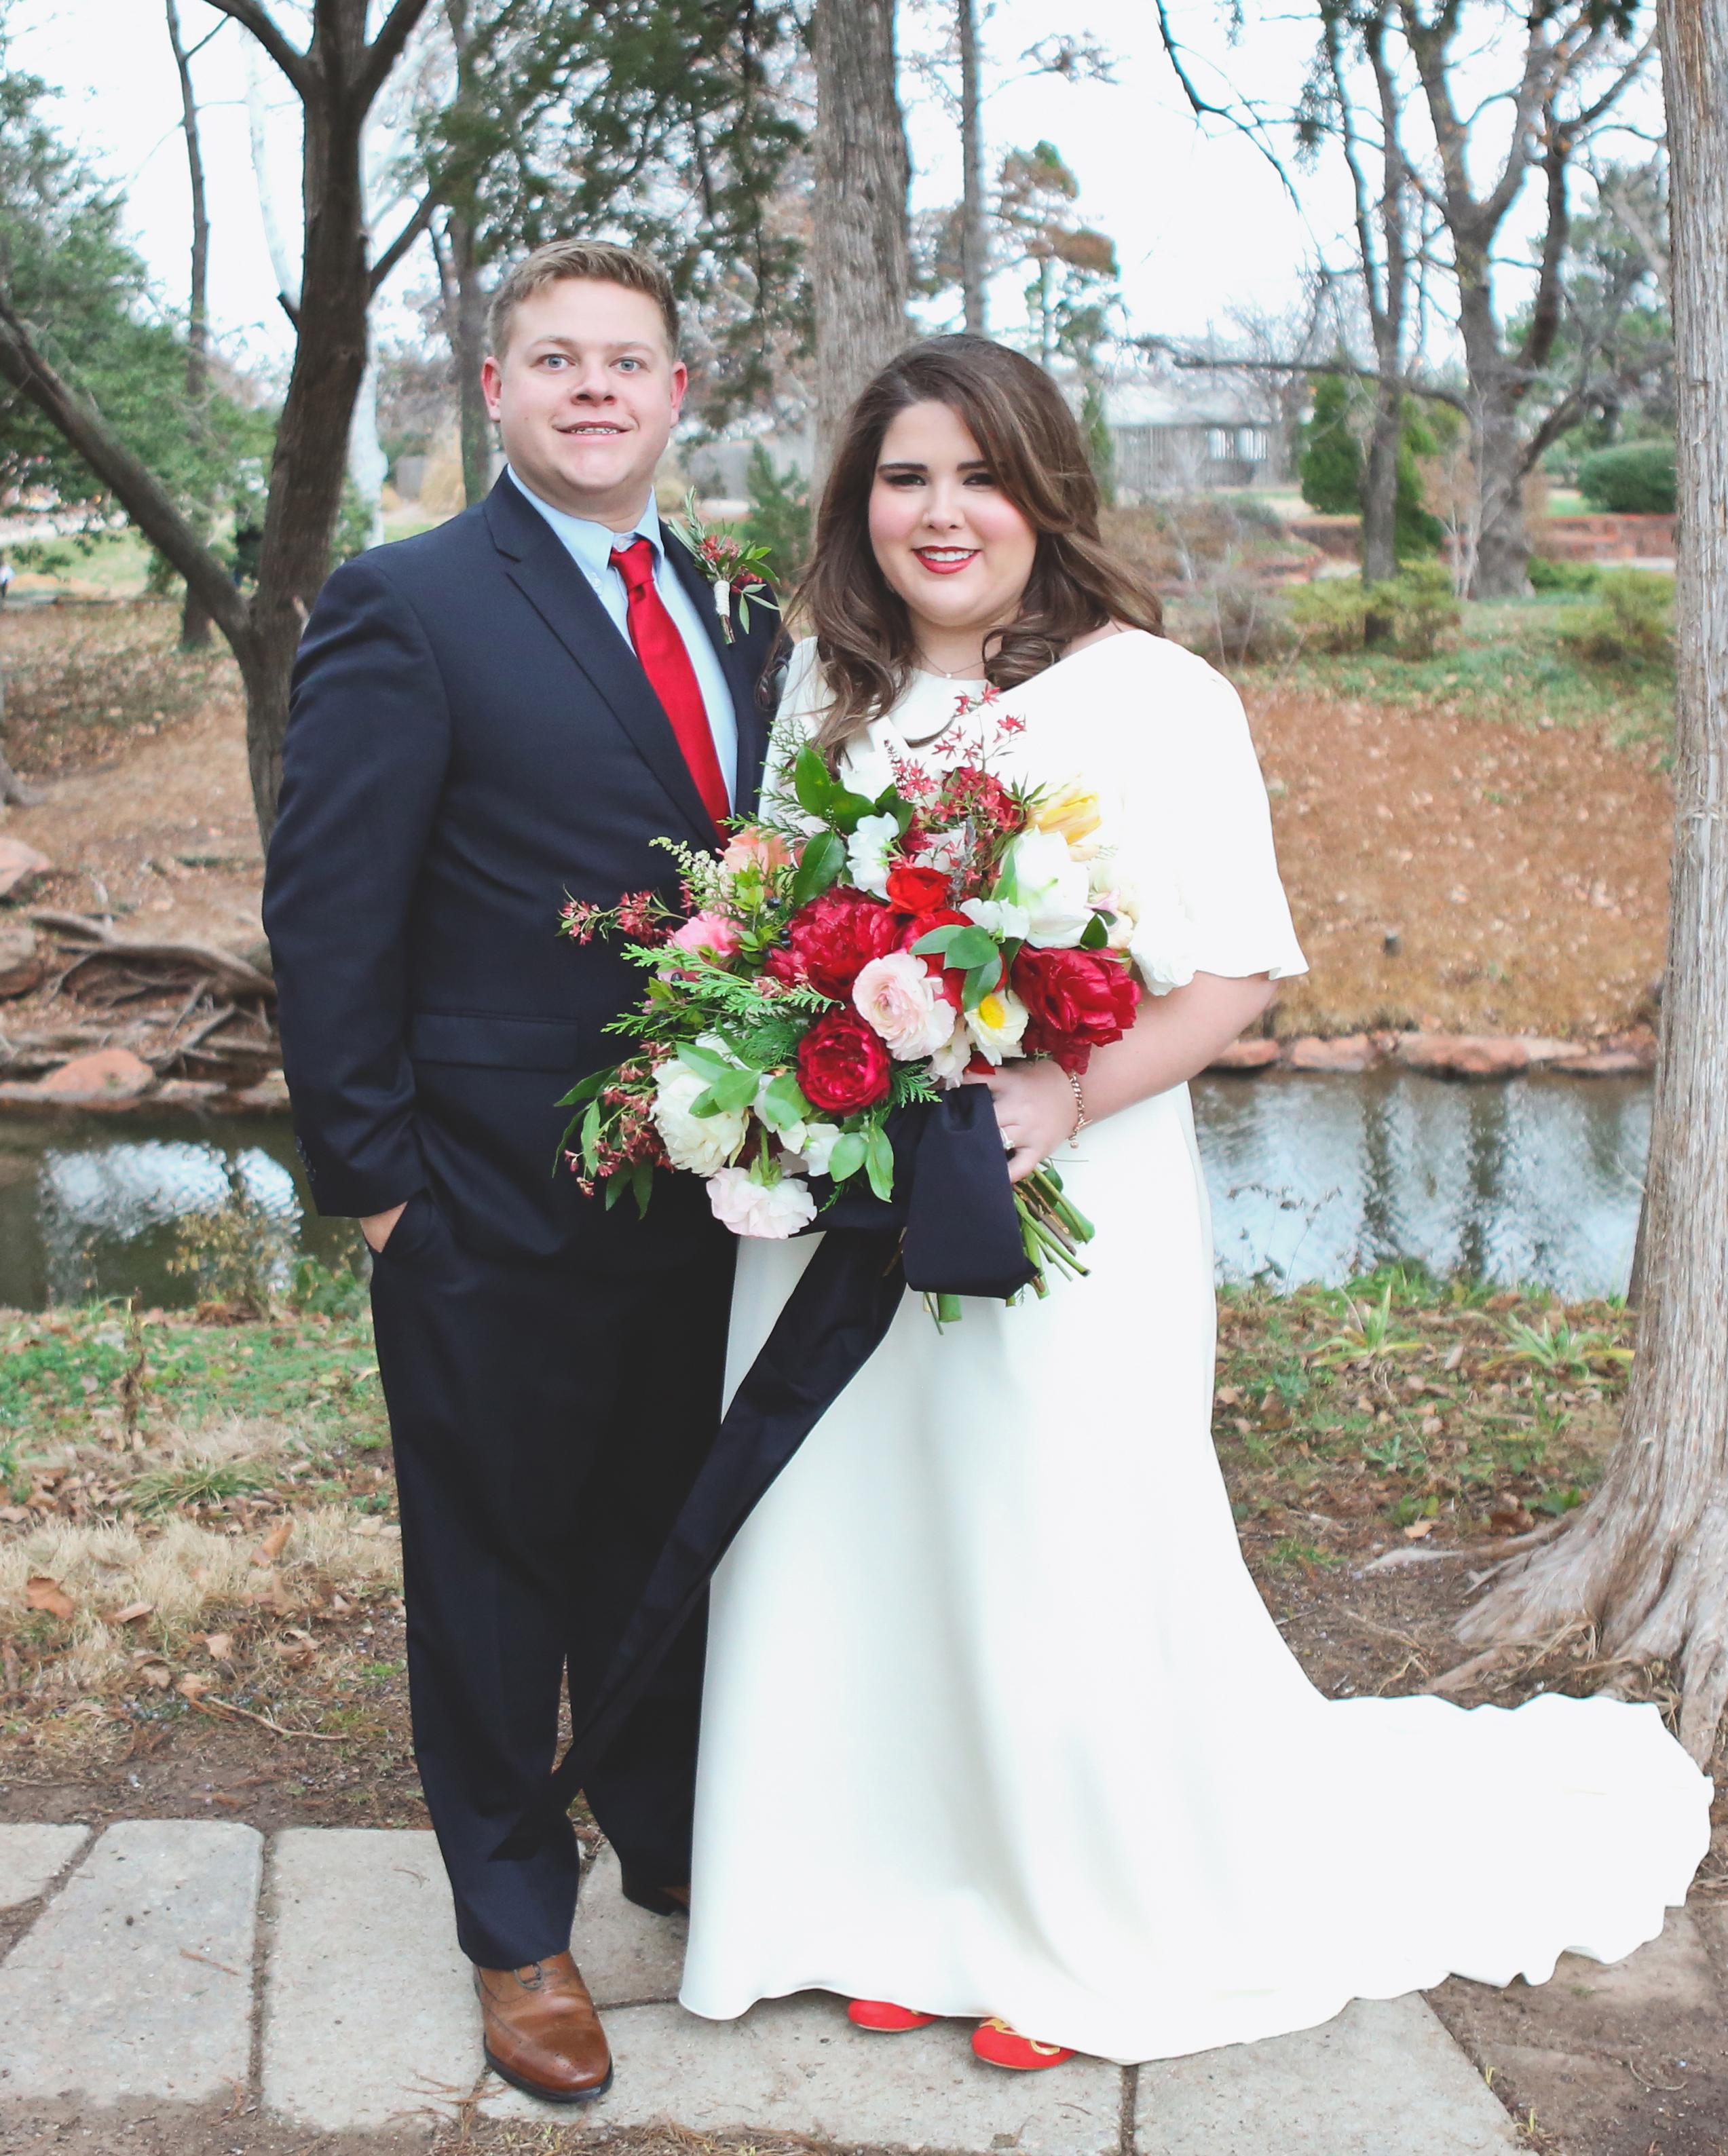 jessie-justin-wedding-couple-36-s112135-0915.jpg